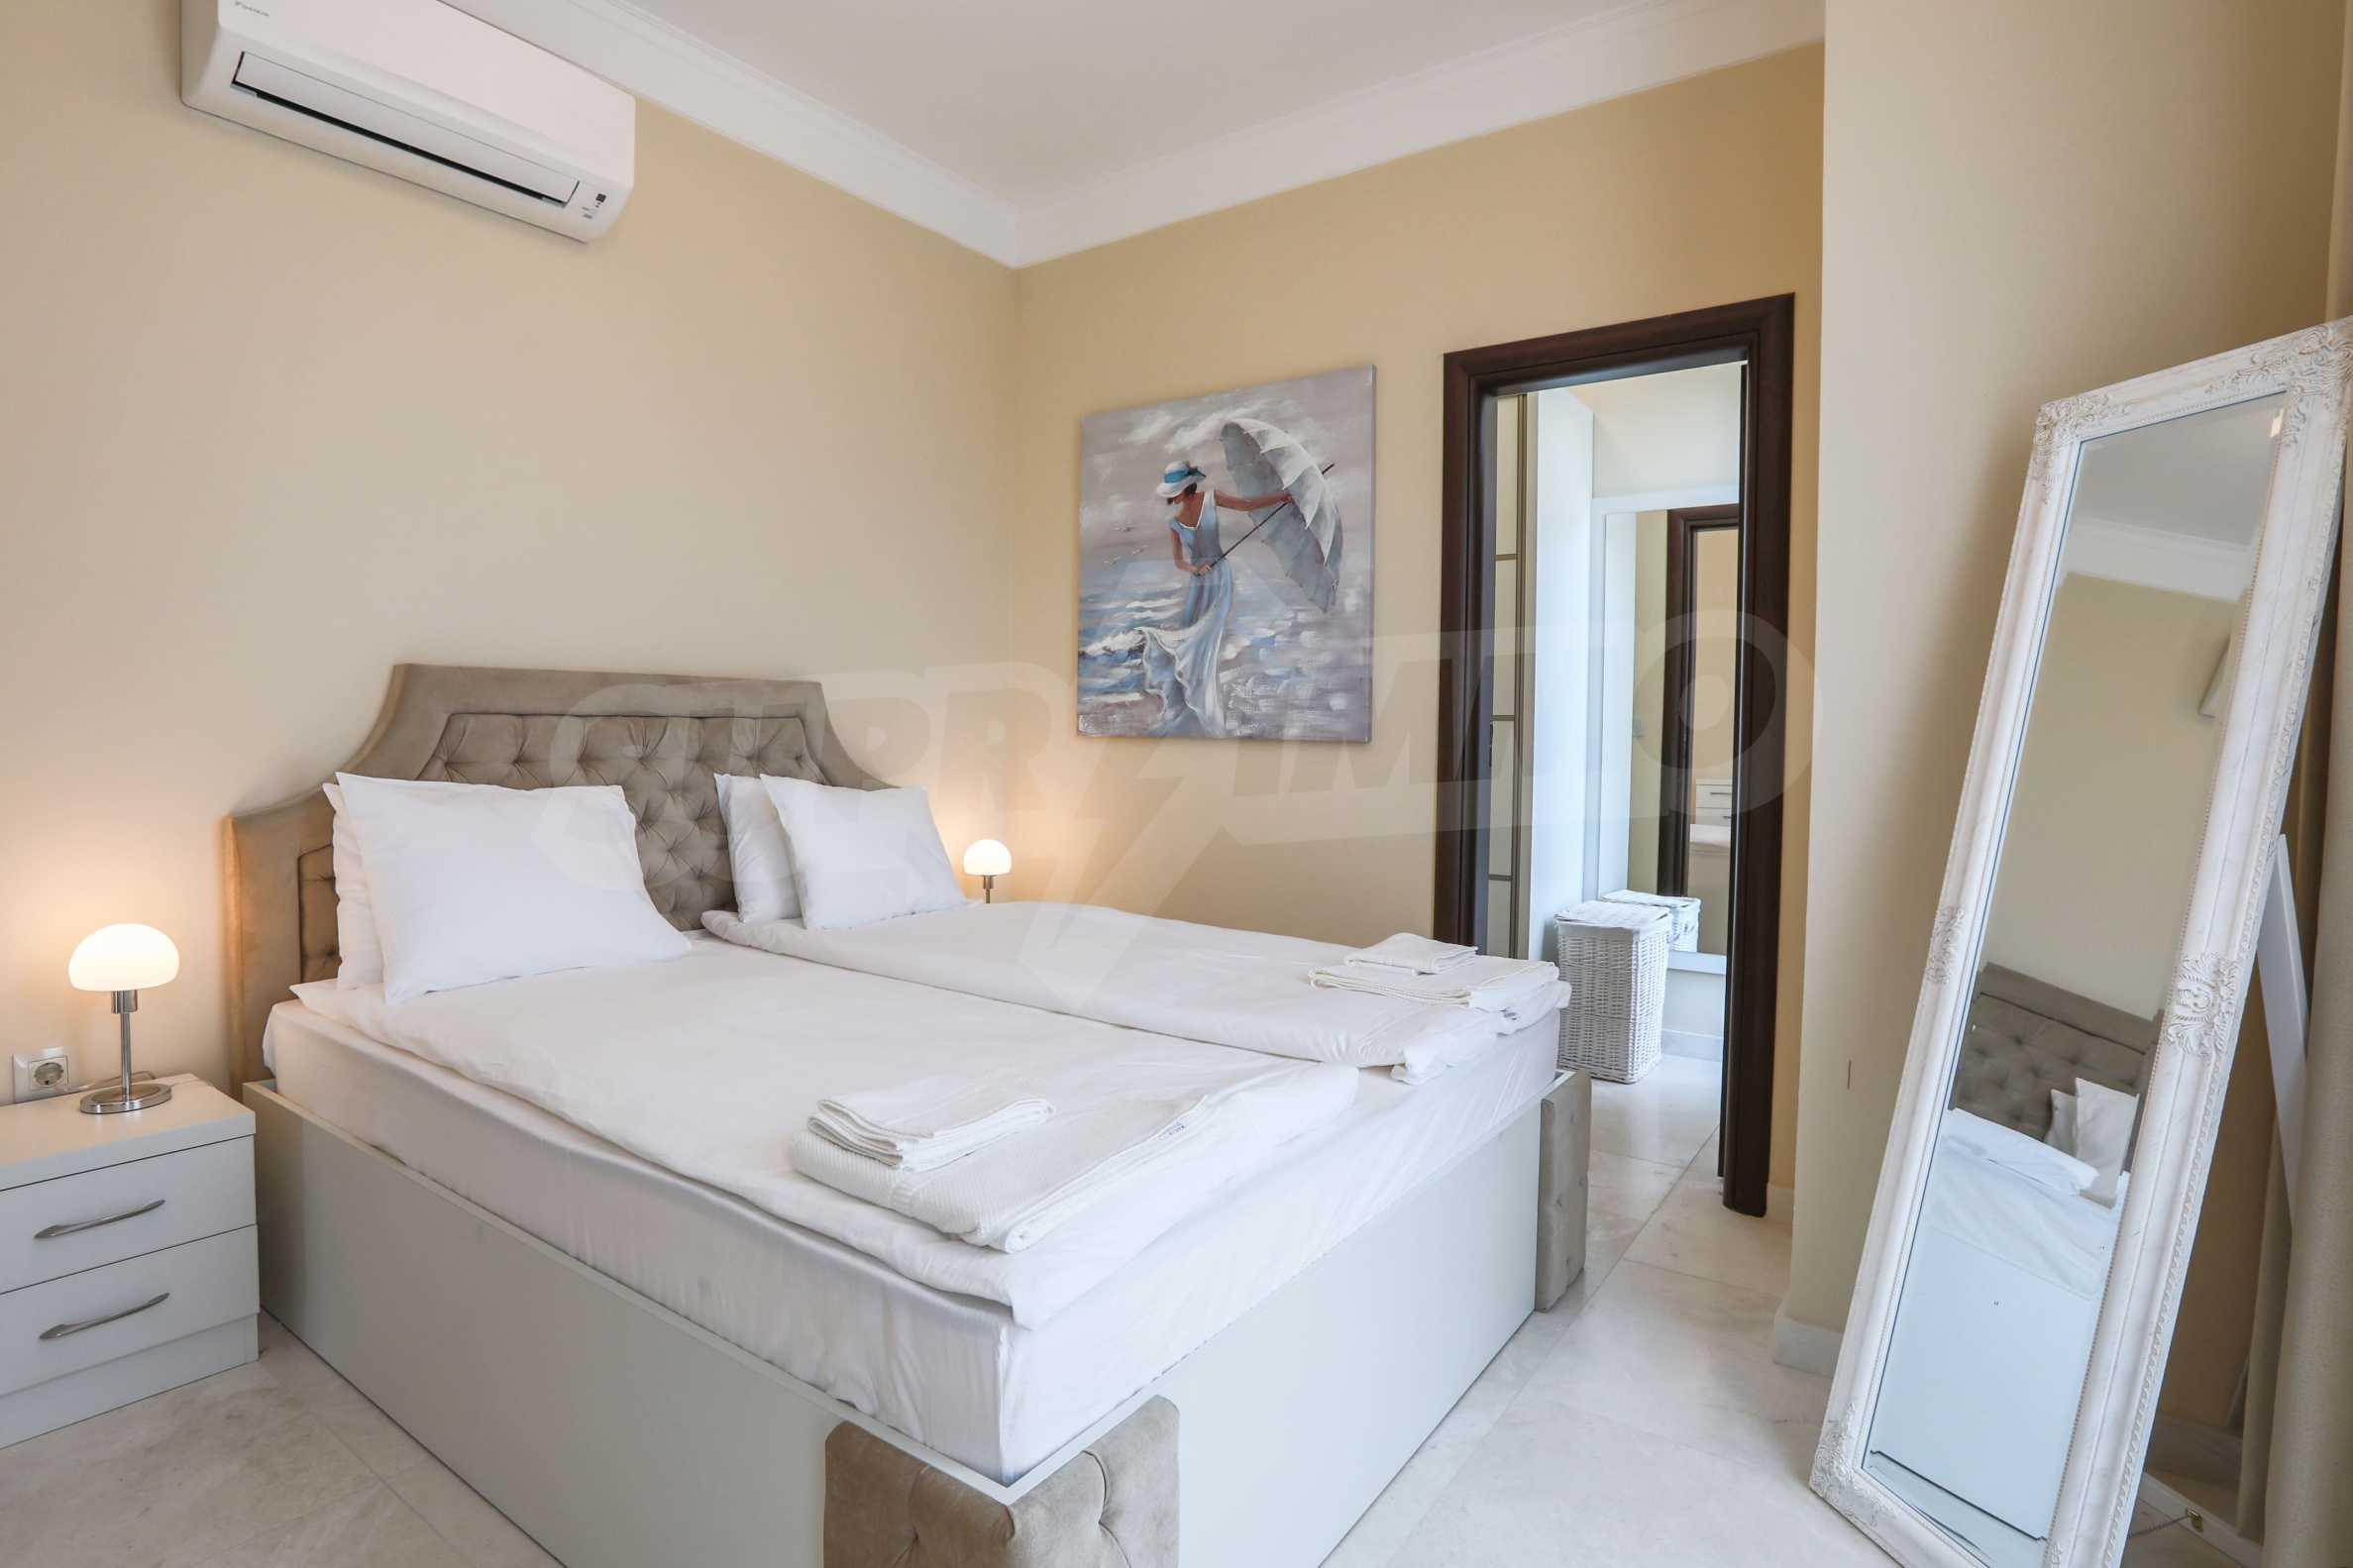 Комфортен двустаен апартамент под наем в Belle Époque Beach Residence, курорт Лозенец 11